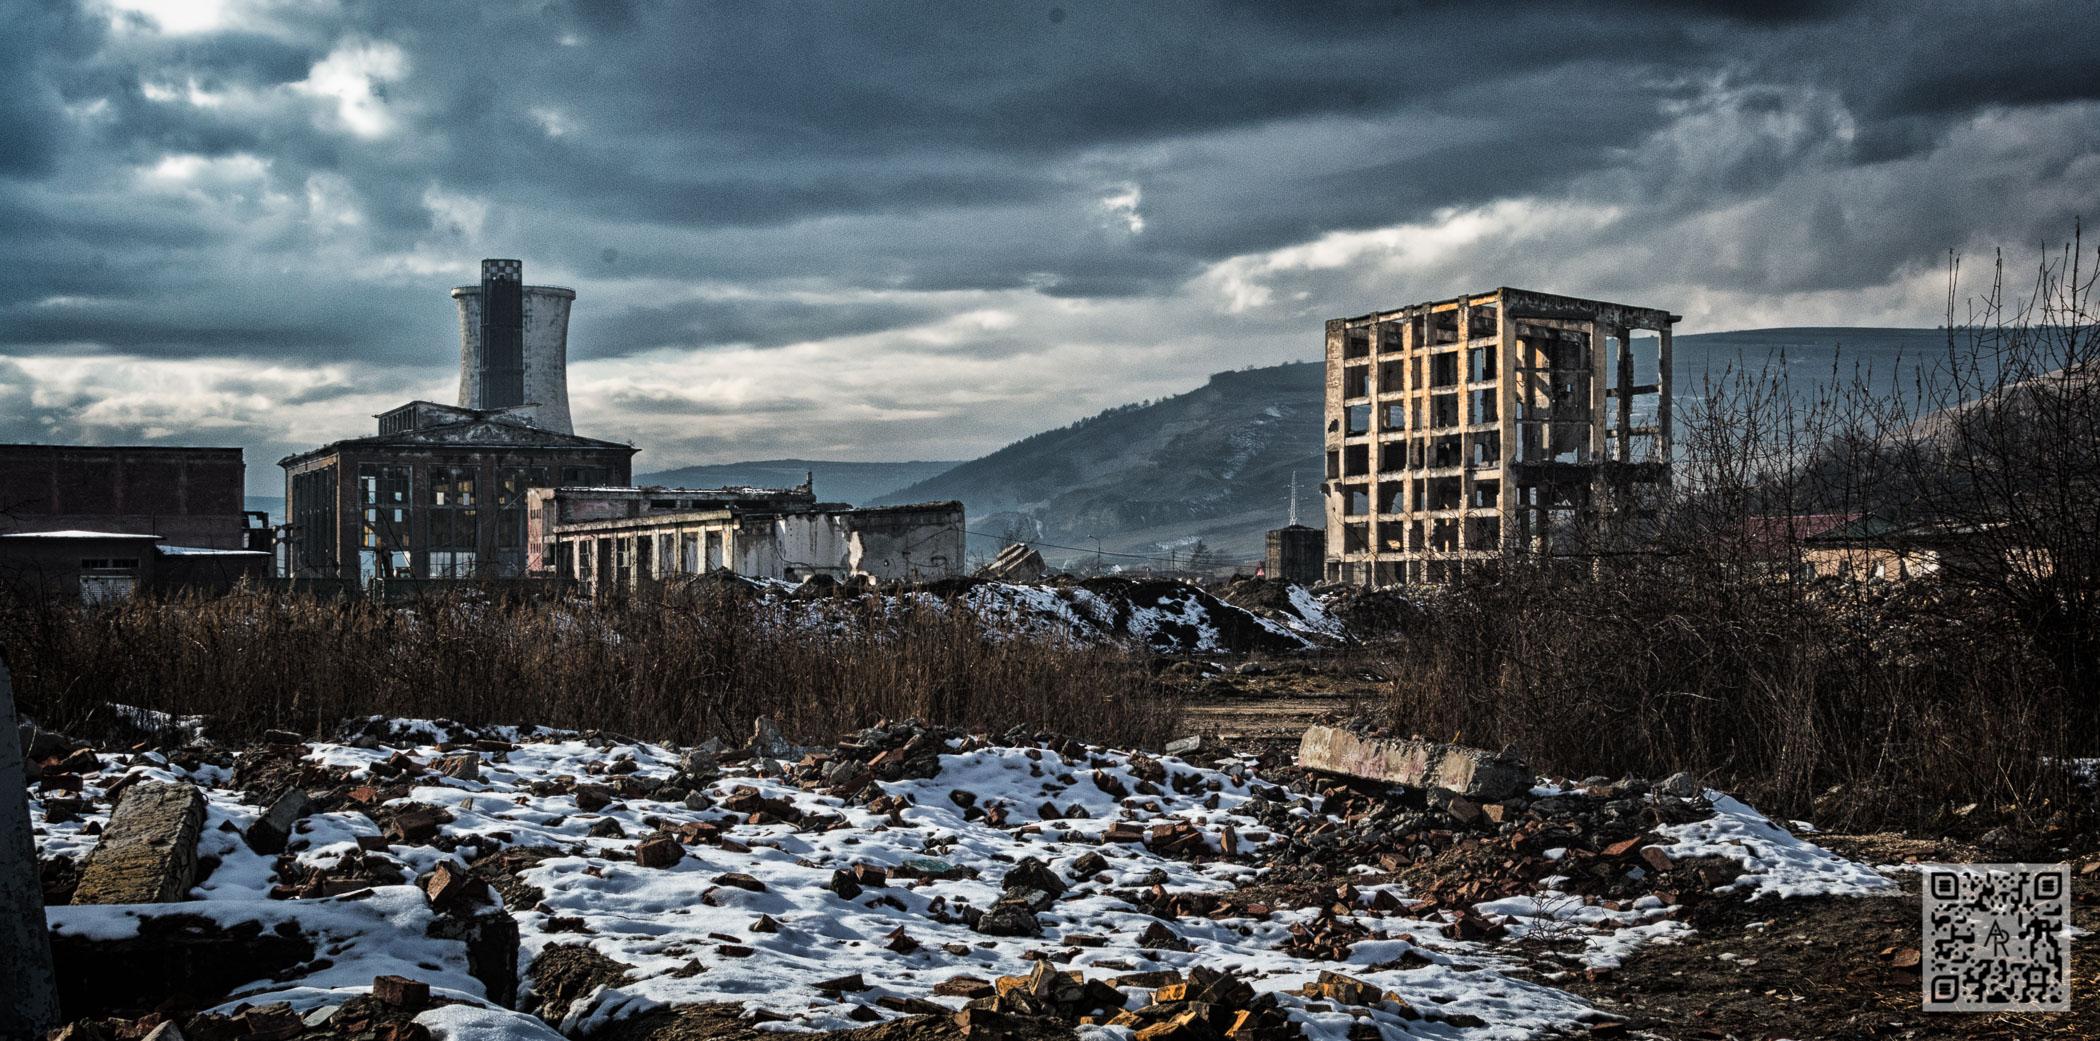 A Dreamscape of Developers Demolition